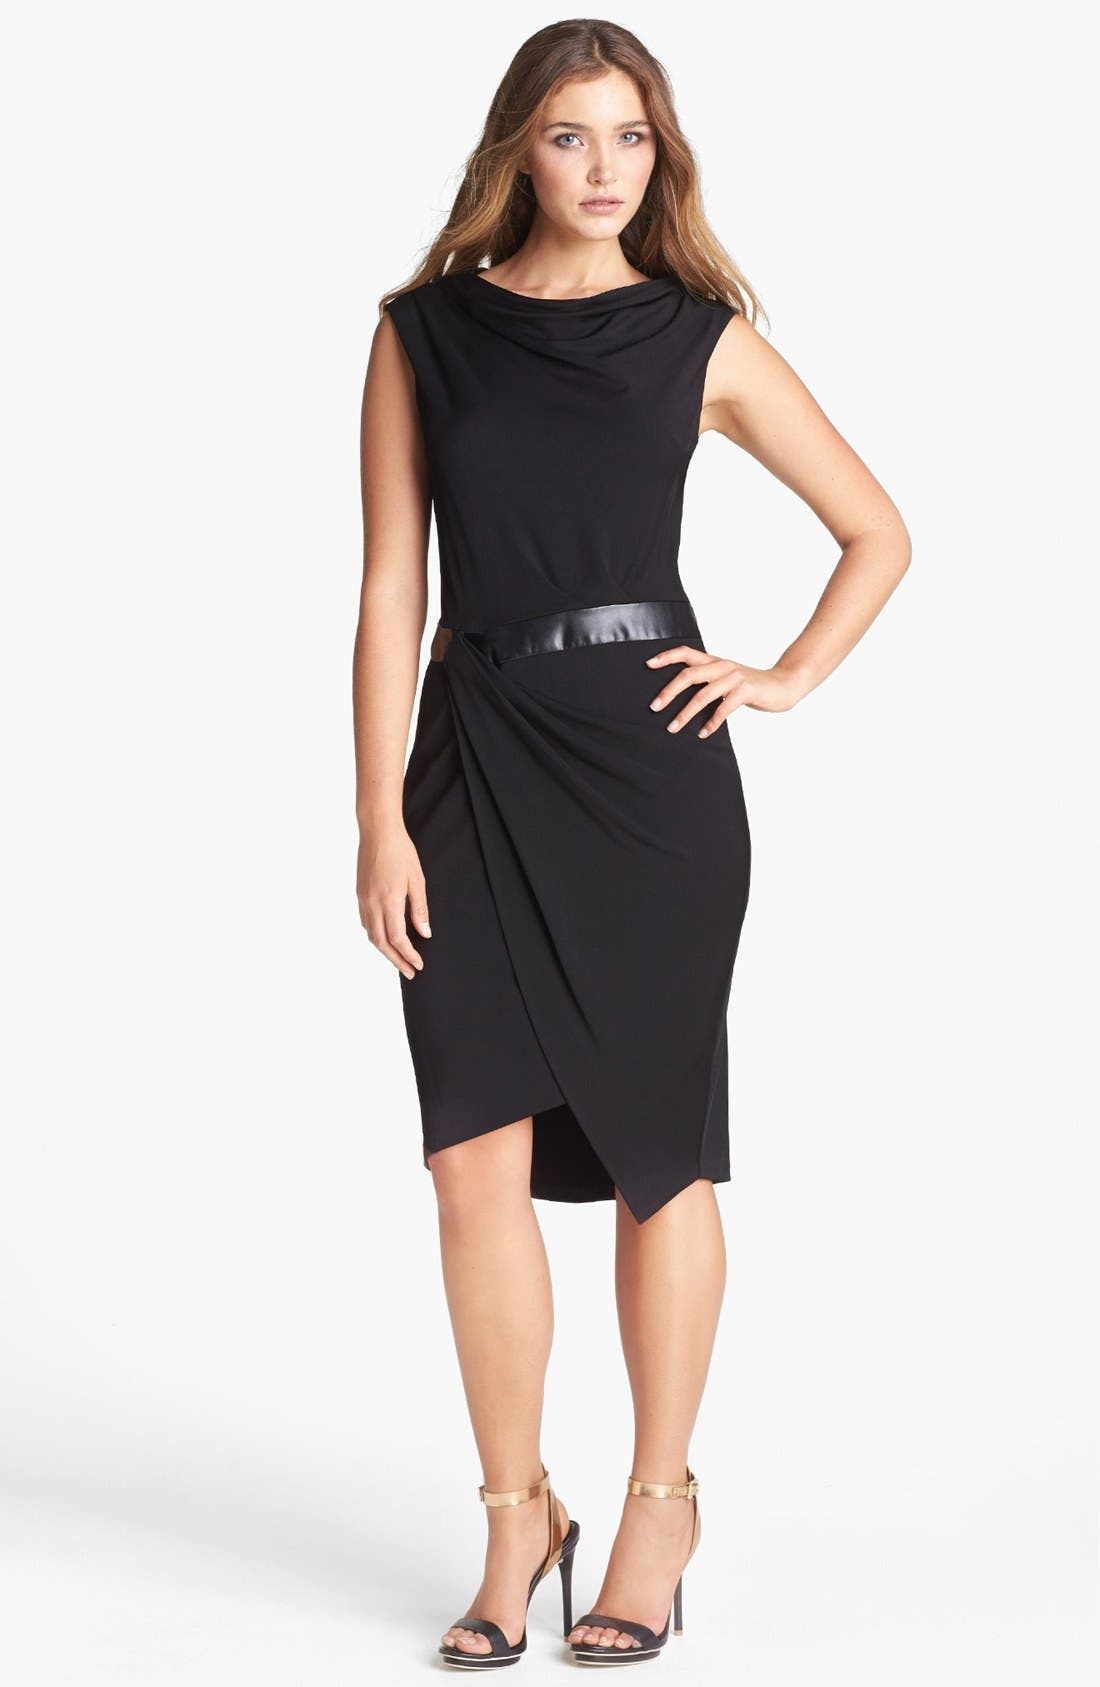 Alternate Image 1 Selected - Vera Wang Faux Leather Inset Drape Jersey Dress